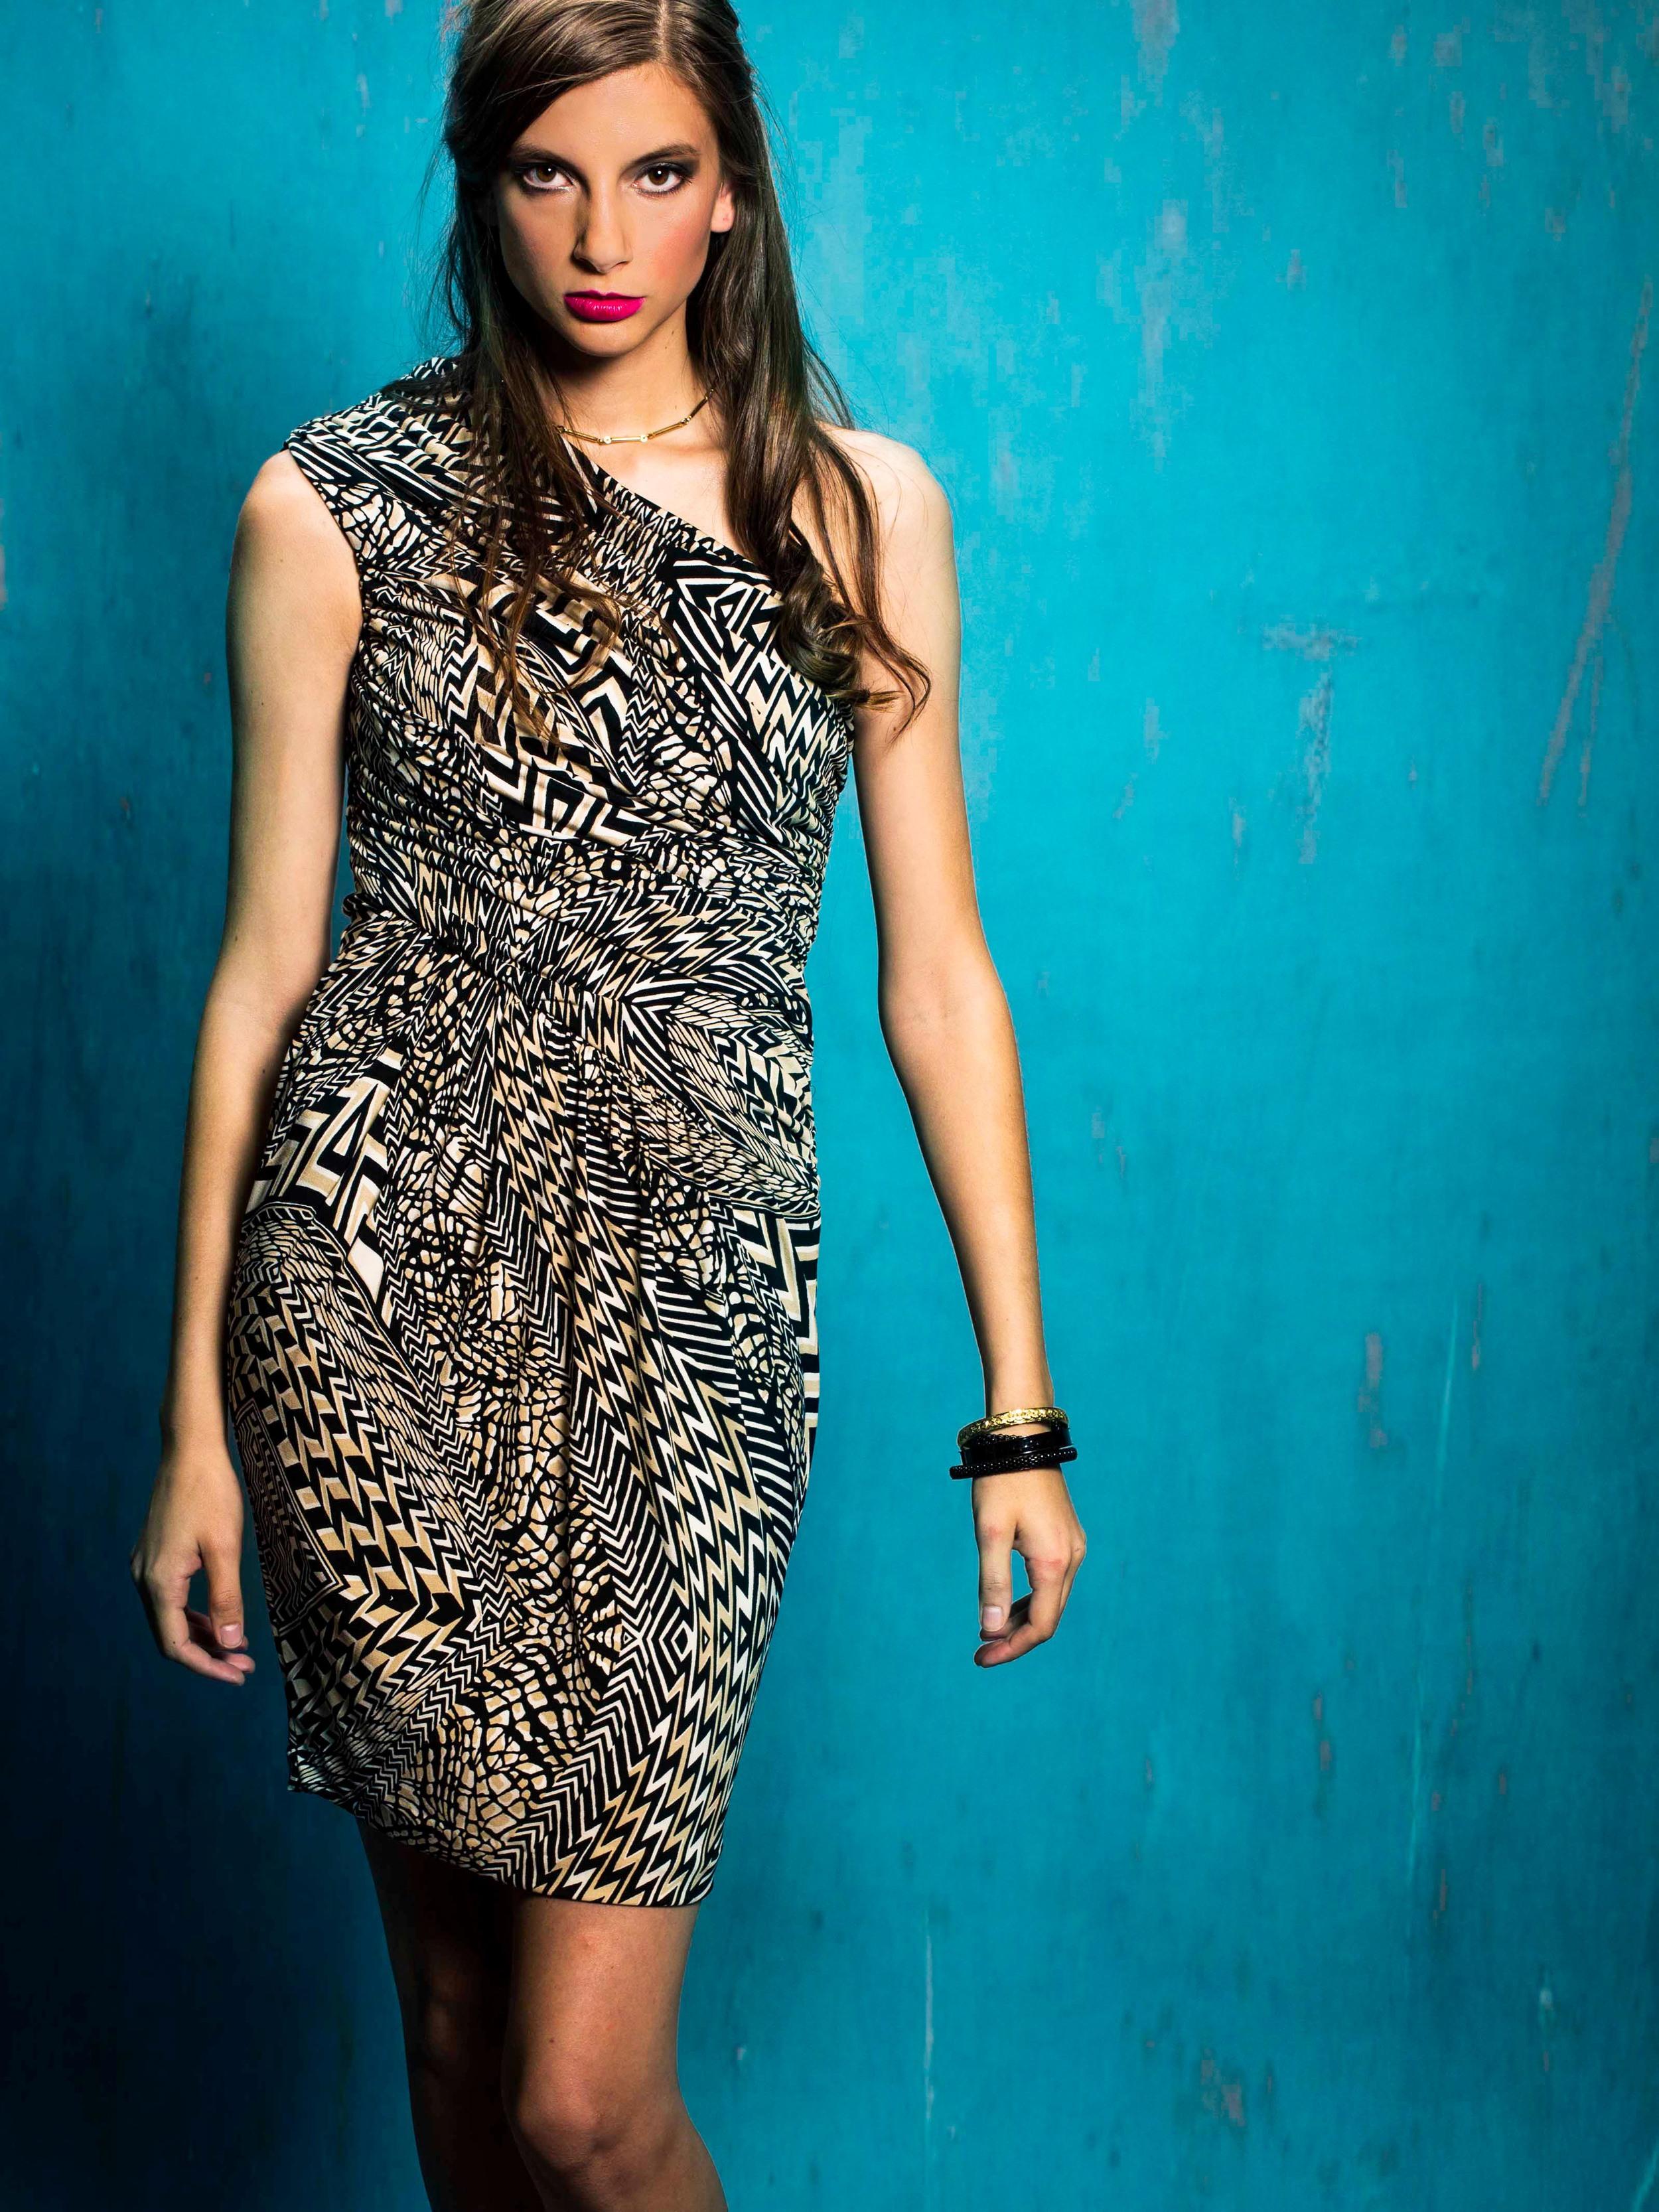 Model - Sarah Sorg, MUA - Danelle French, Hair & fashion by Lila Sierra